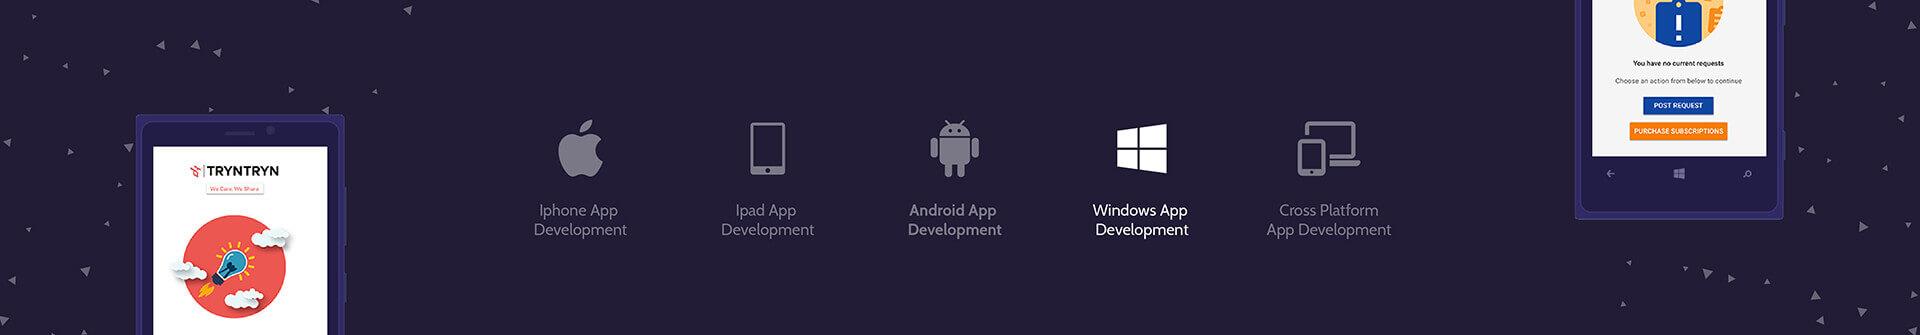 Windows Mobile App Development Company